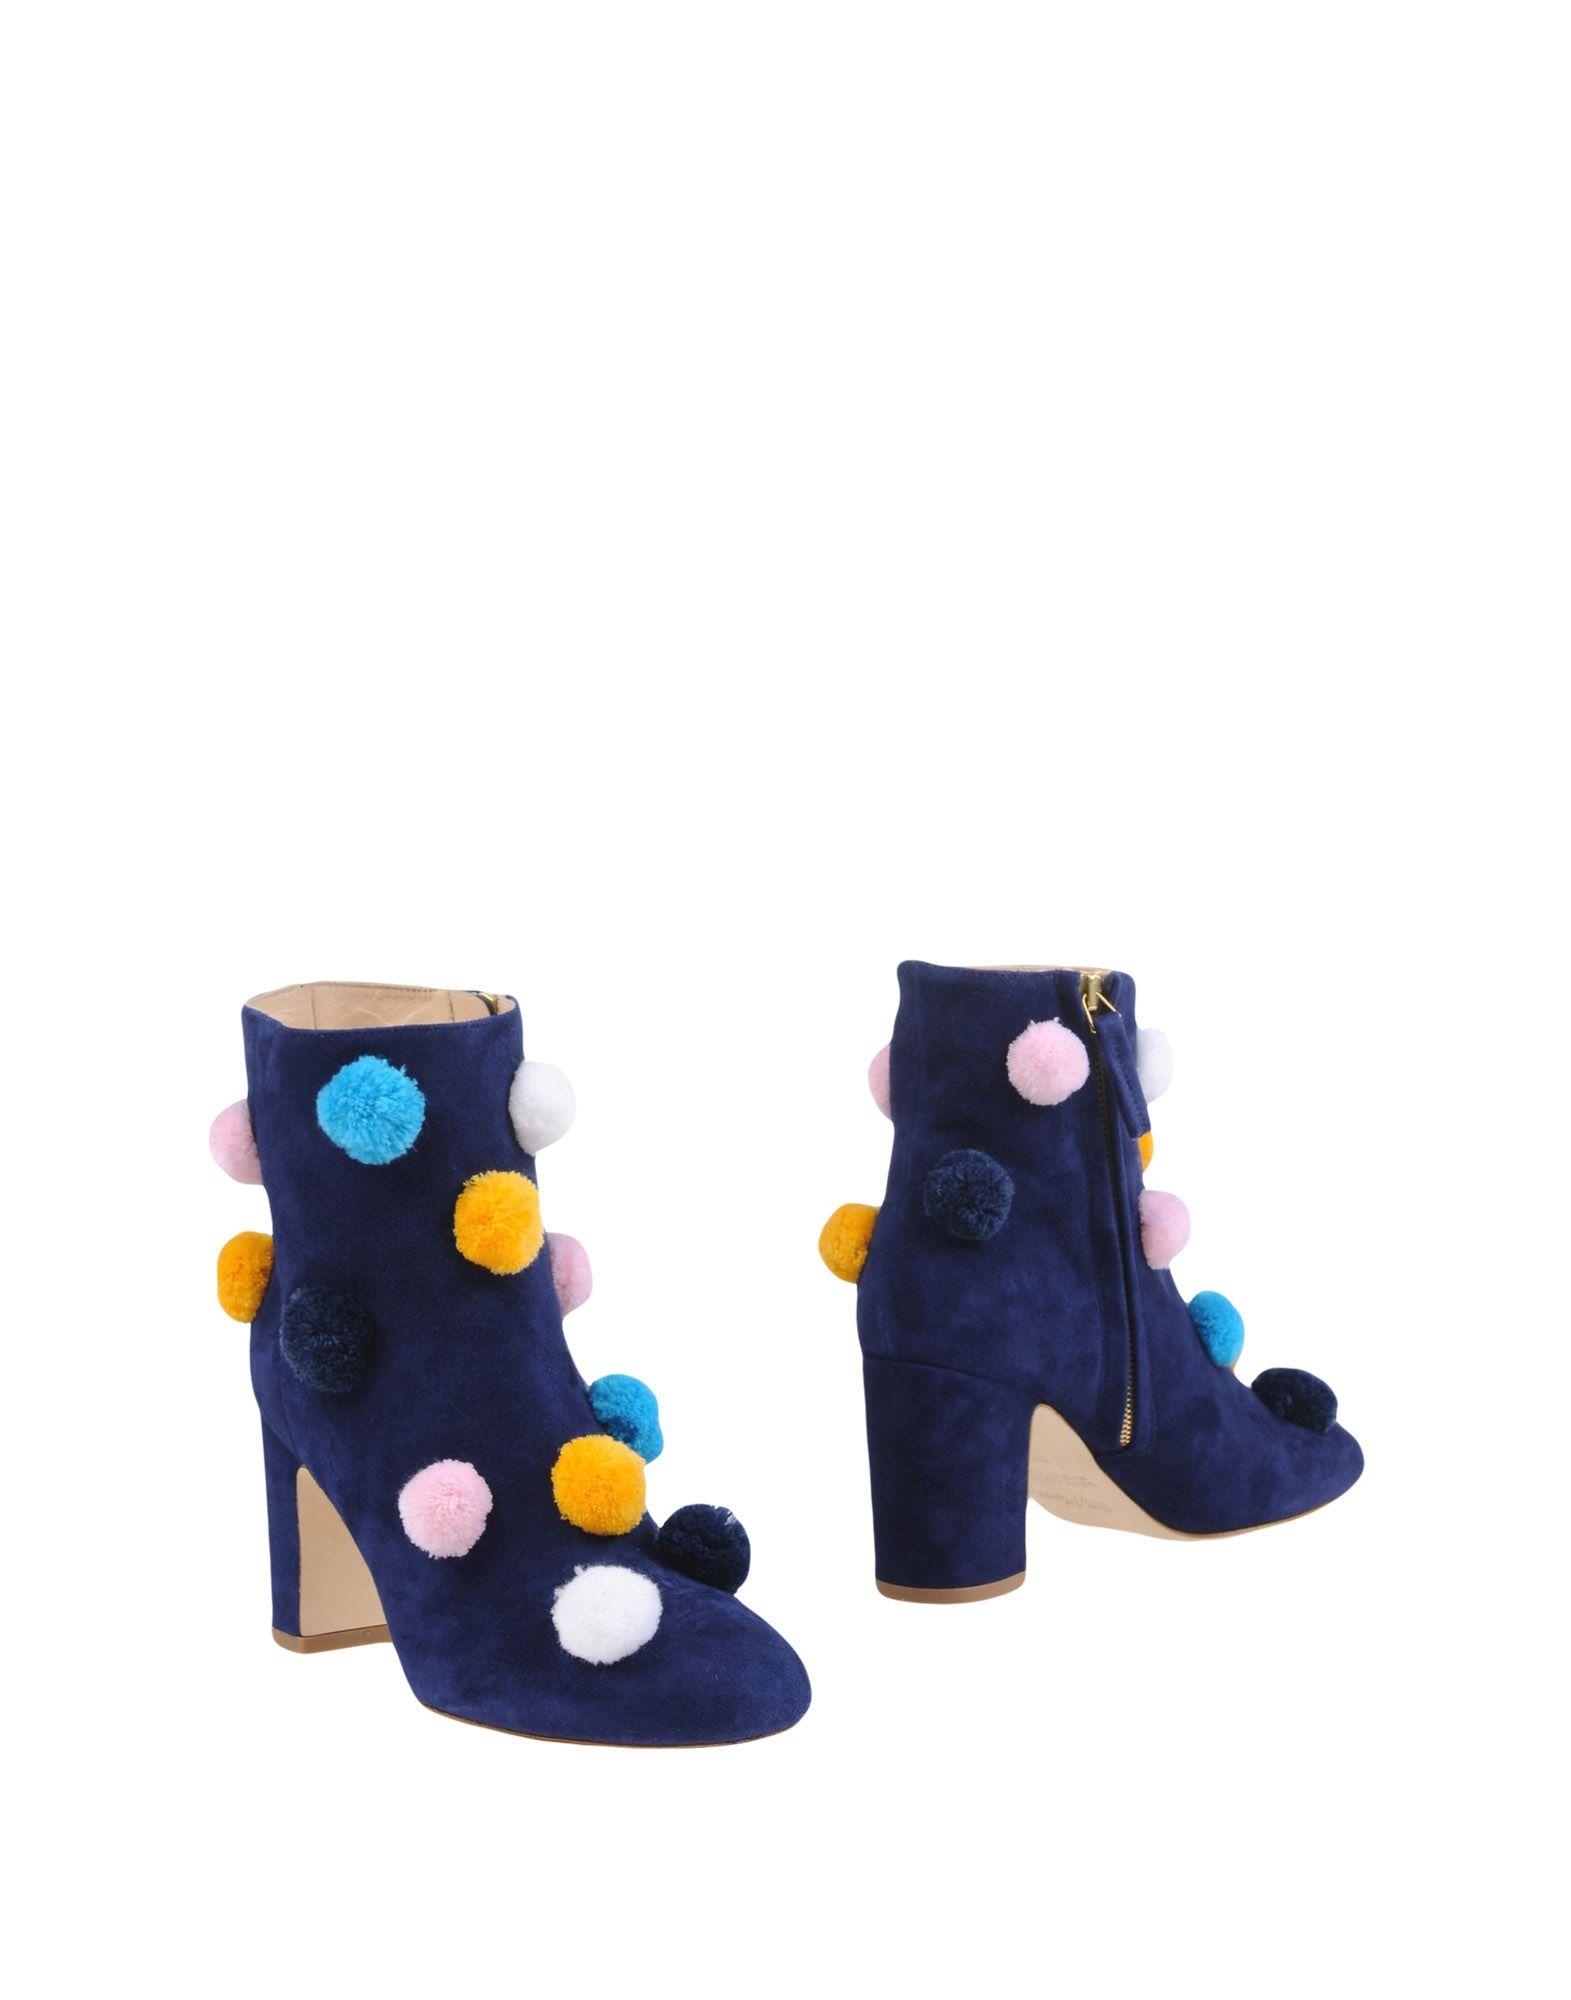 Stilvolle billige Stiefelette Schuhe Polly Plume Stiefelette billige Damen  11223535AV 69bd71